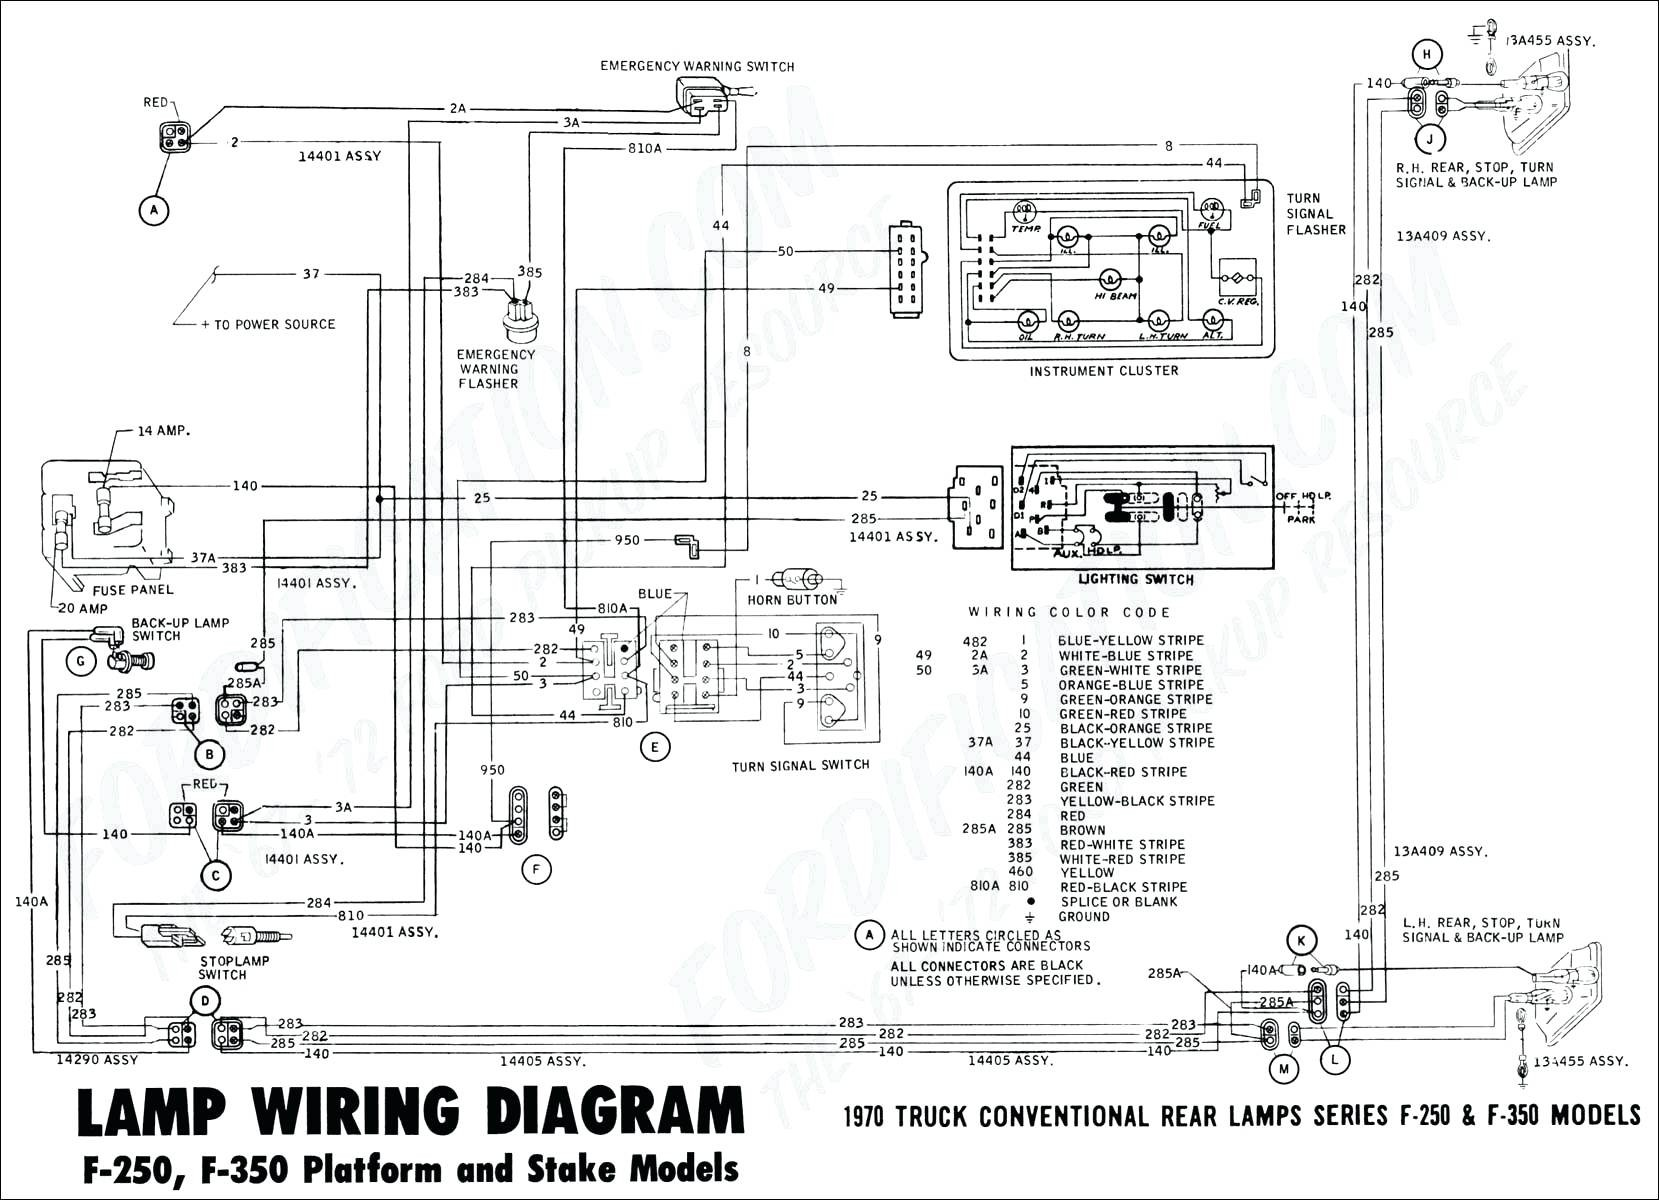 hight resolution of 2005 chevy silverado tail light wiring diagram tail light wiring diagram 1996 chevy truck colorado electrical